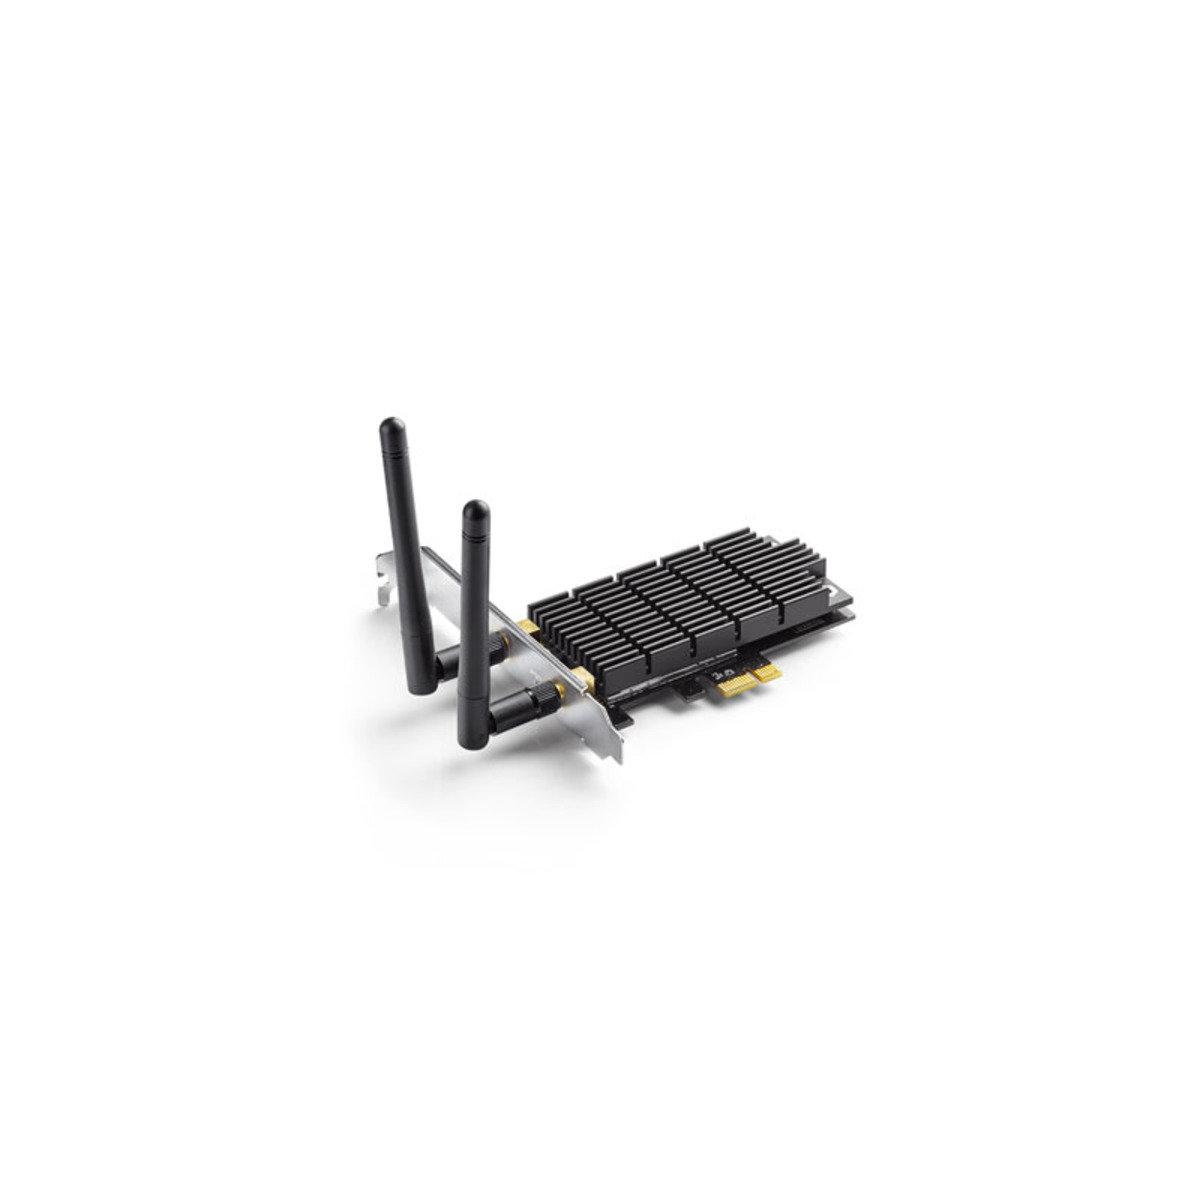 AC1300 無線雙頻PC內置高效能接收卡 T6E